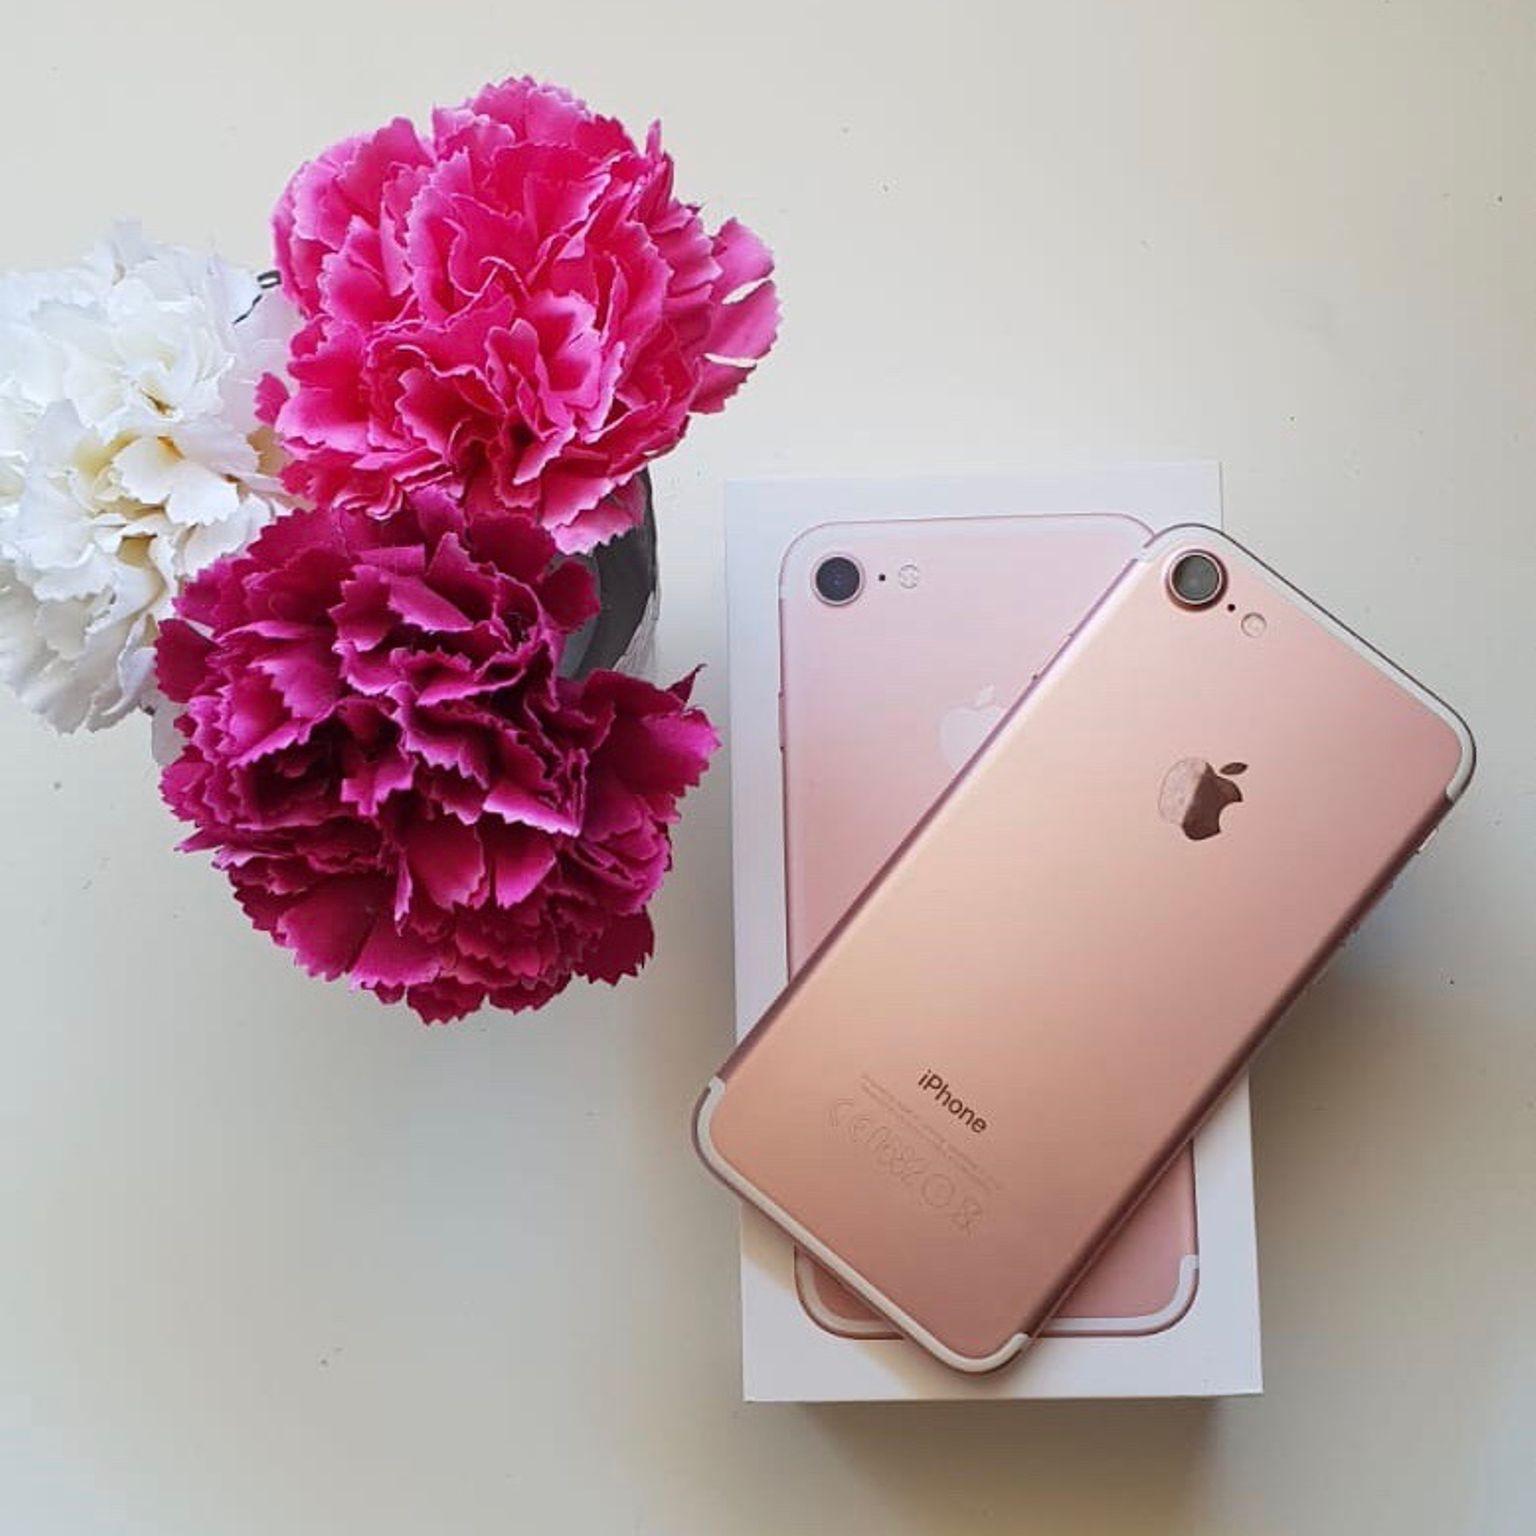 iPhone 7 128GB Rosegold 286ad9bf